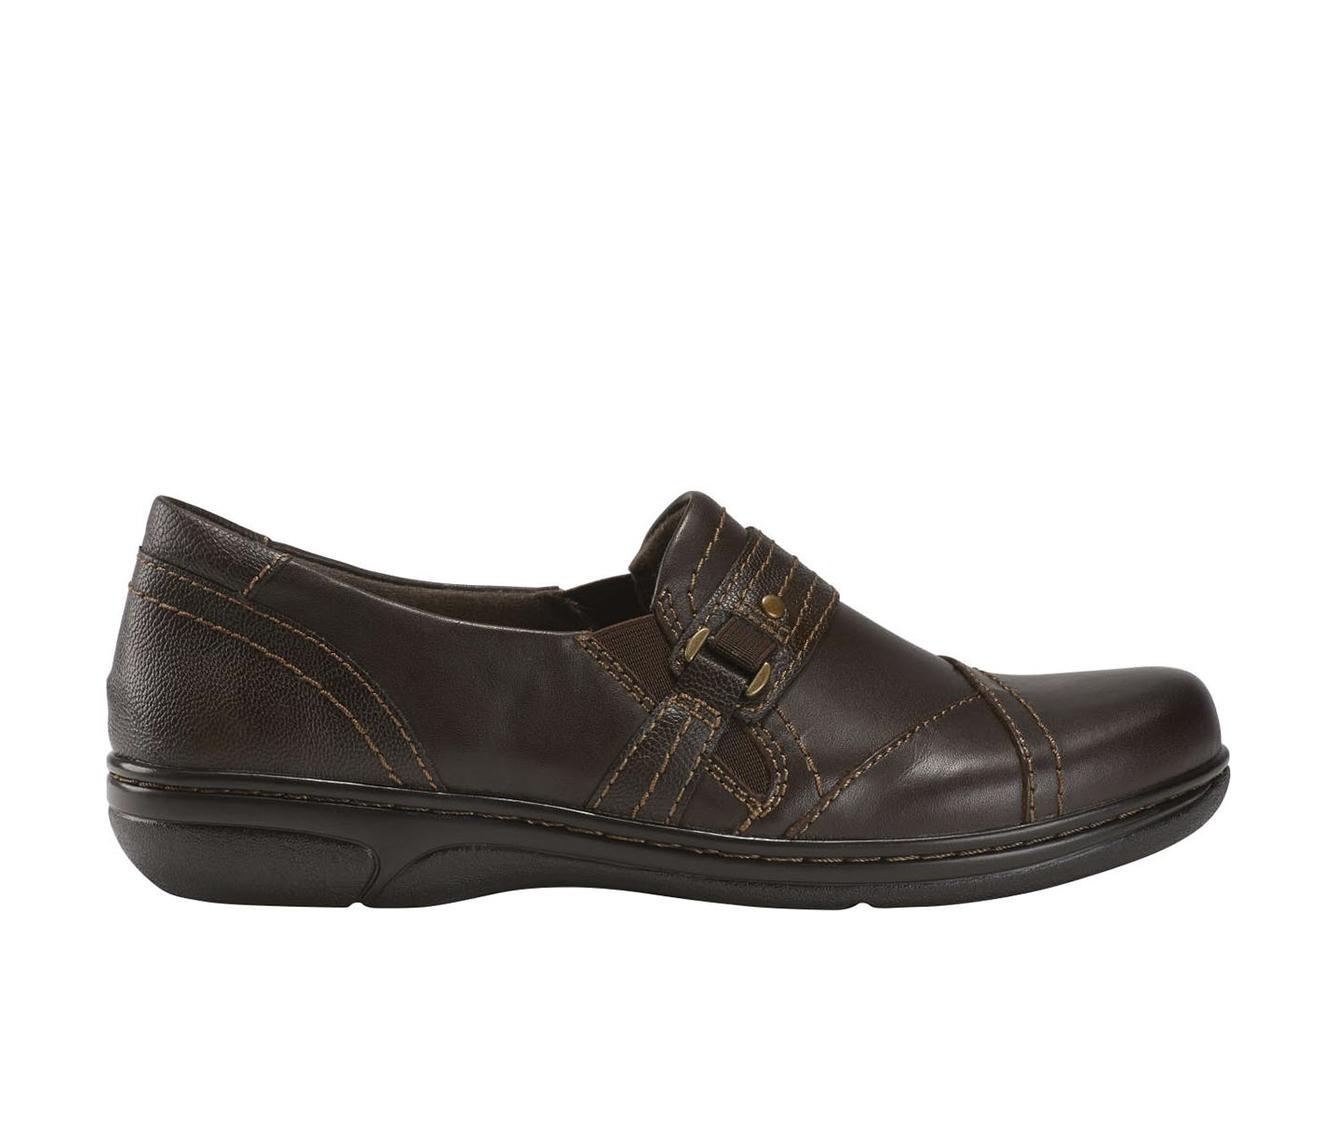 Earth Origins Glendale Gloria Women's Shoe (Brown Leather)